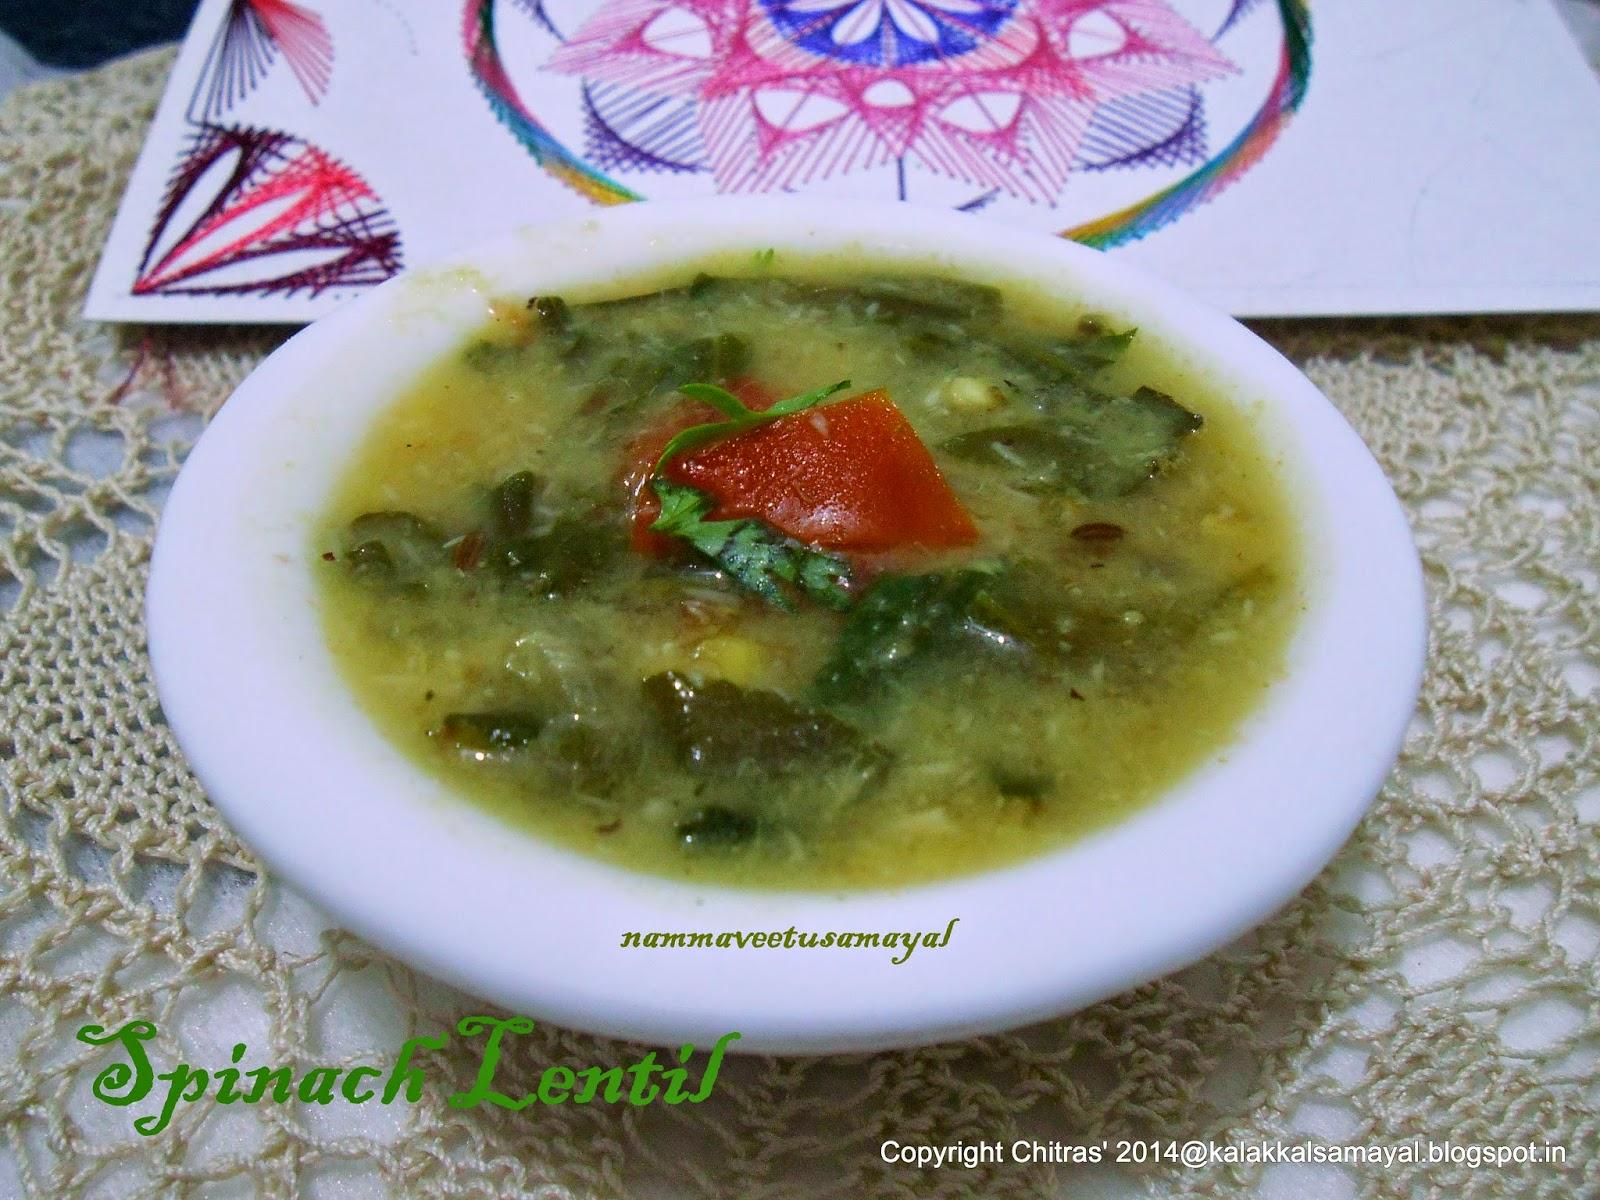 Spinach Lentil [ Sambar Pasalai dhal ]